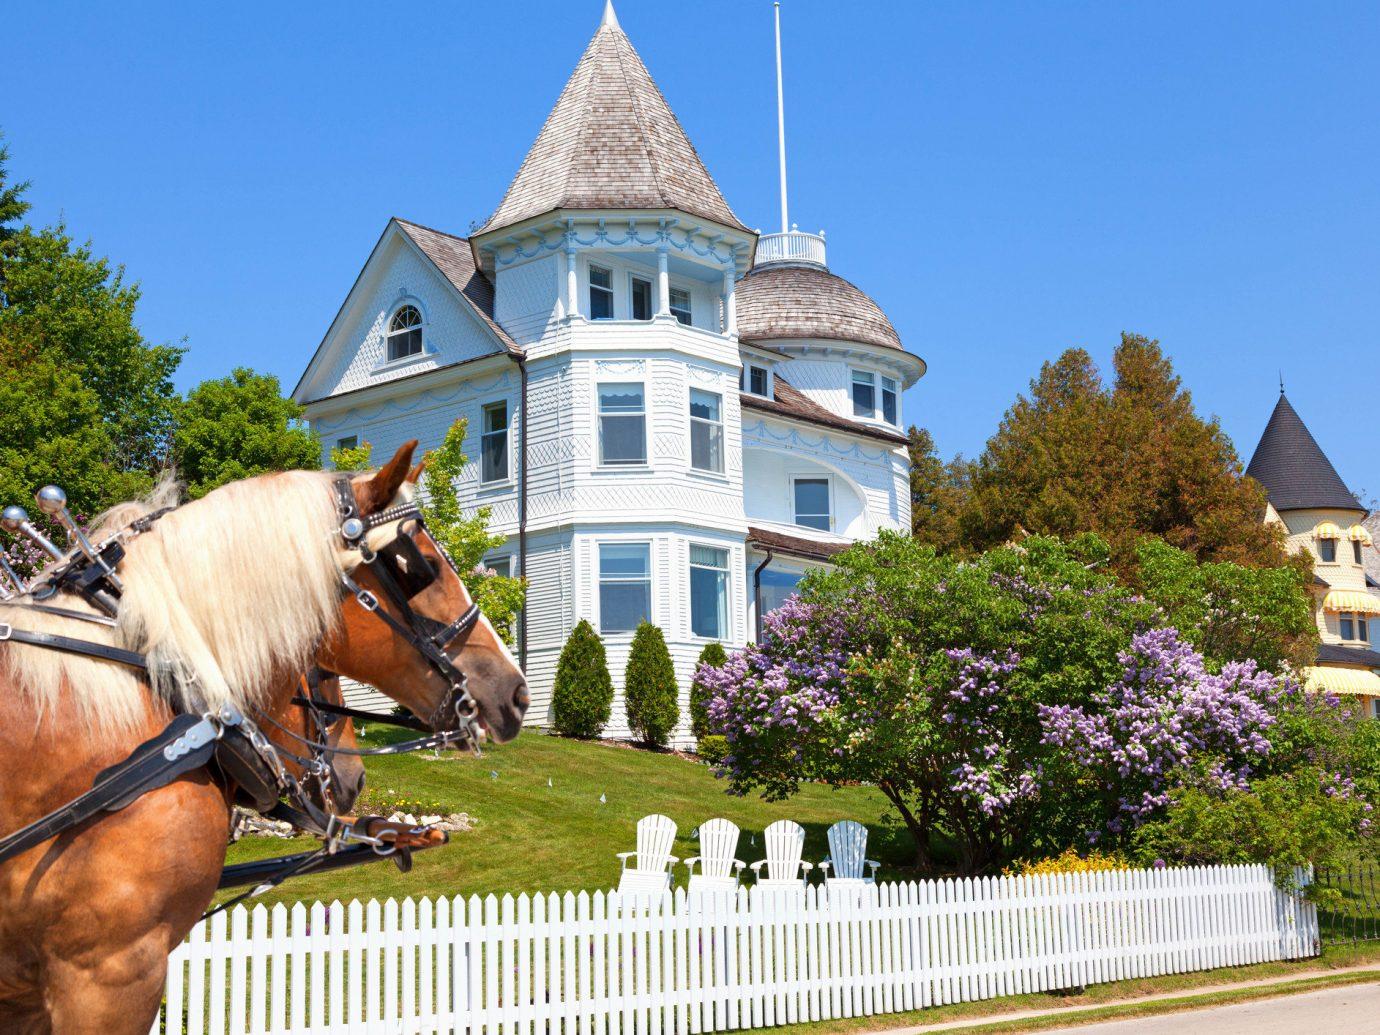 Trip Ideas outdoor sky tree building tourism vacation amusement park estate park place of worship carriage horse